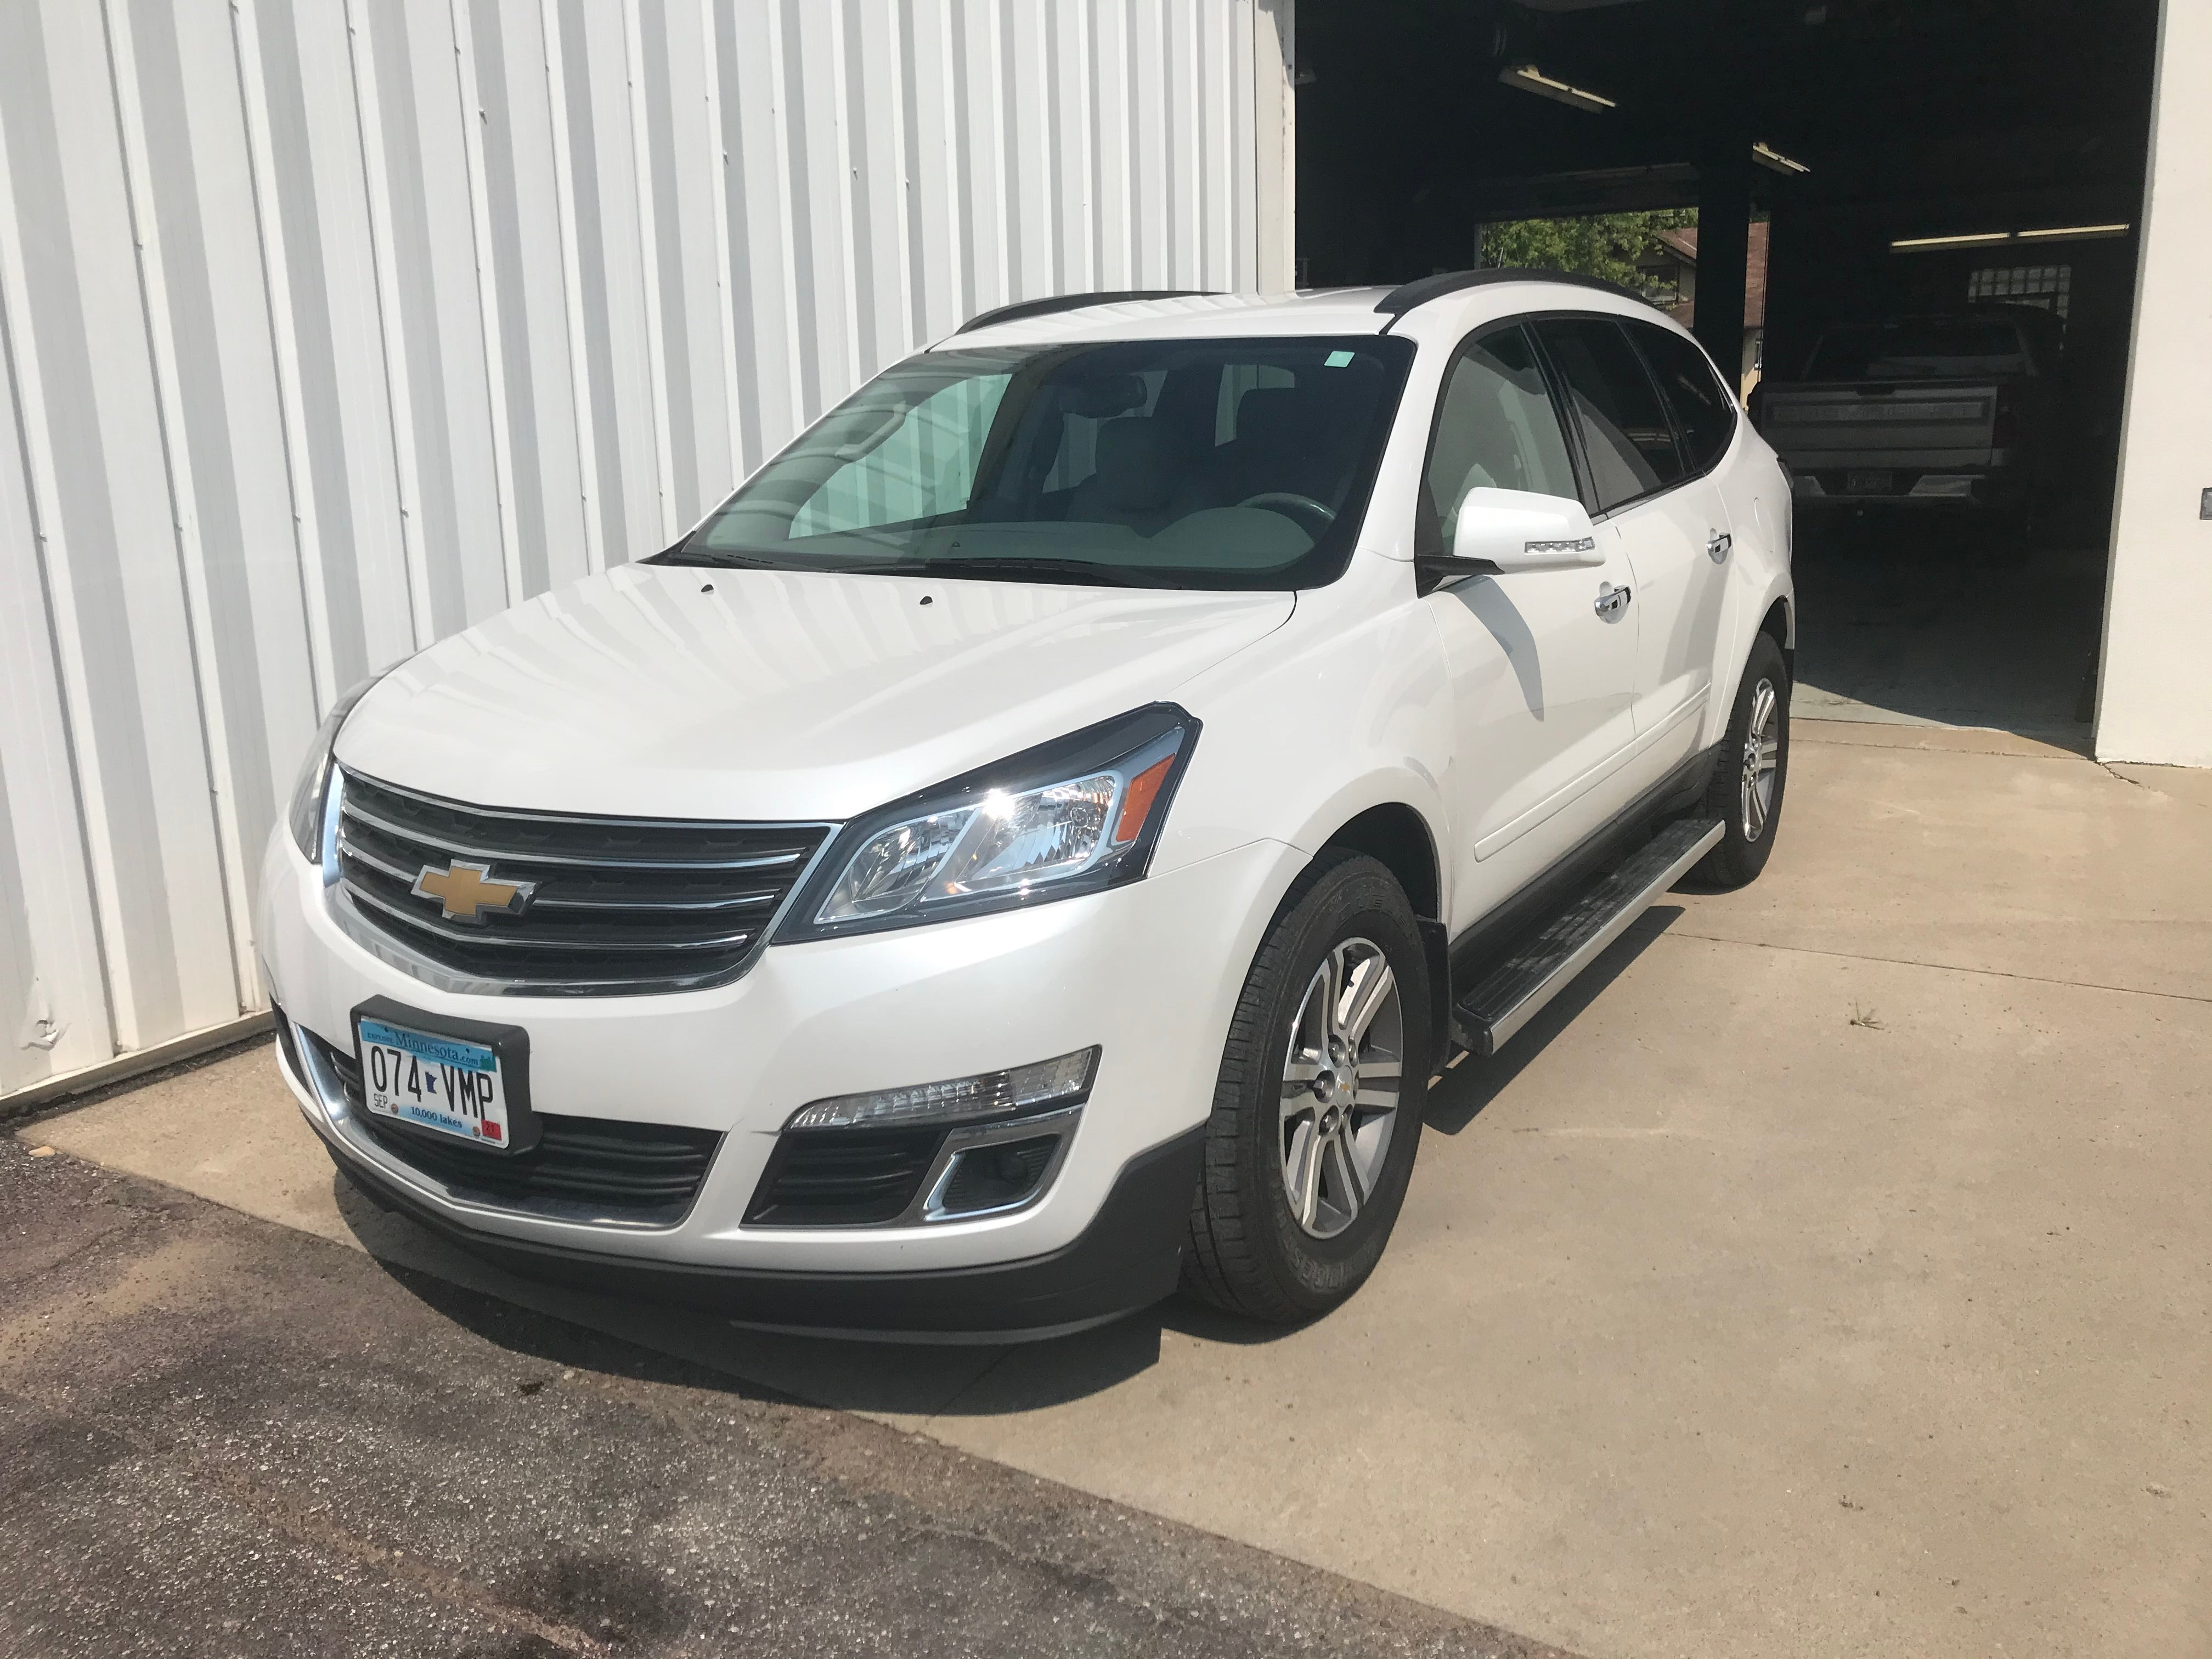 Used 2017 Chevrolet Traverse 2LT with VIN 1GNKVHKD0HJ177573 for sale in Arlington, Minnesota